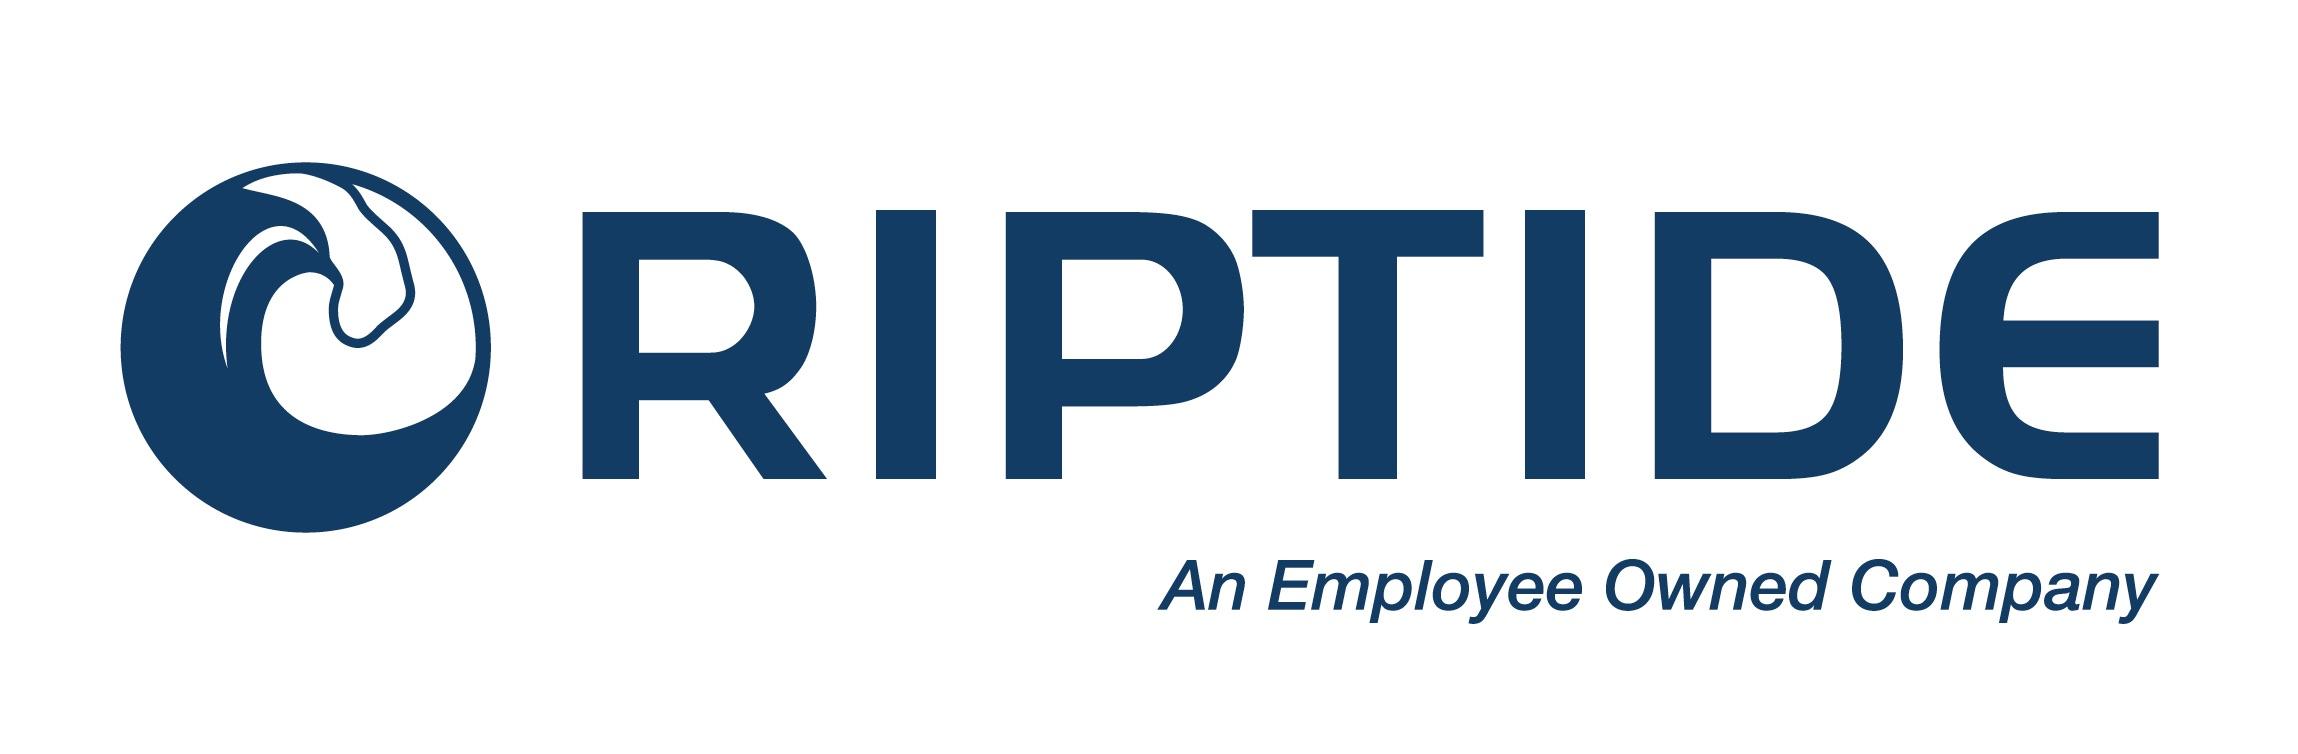 Ripetide logo